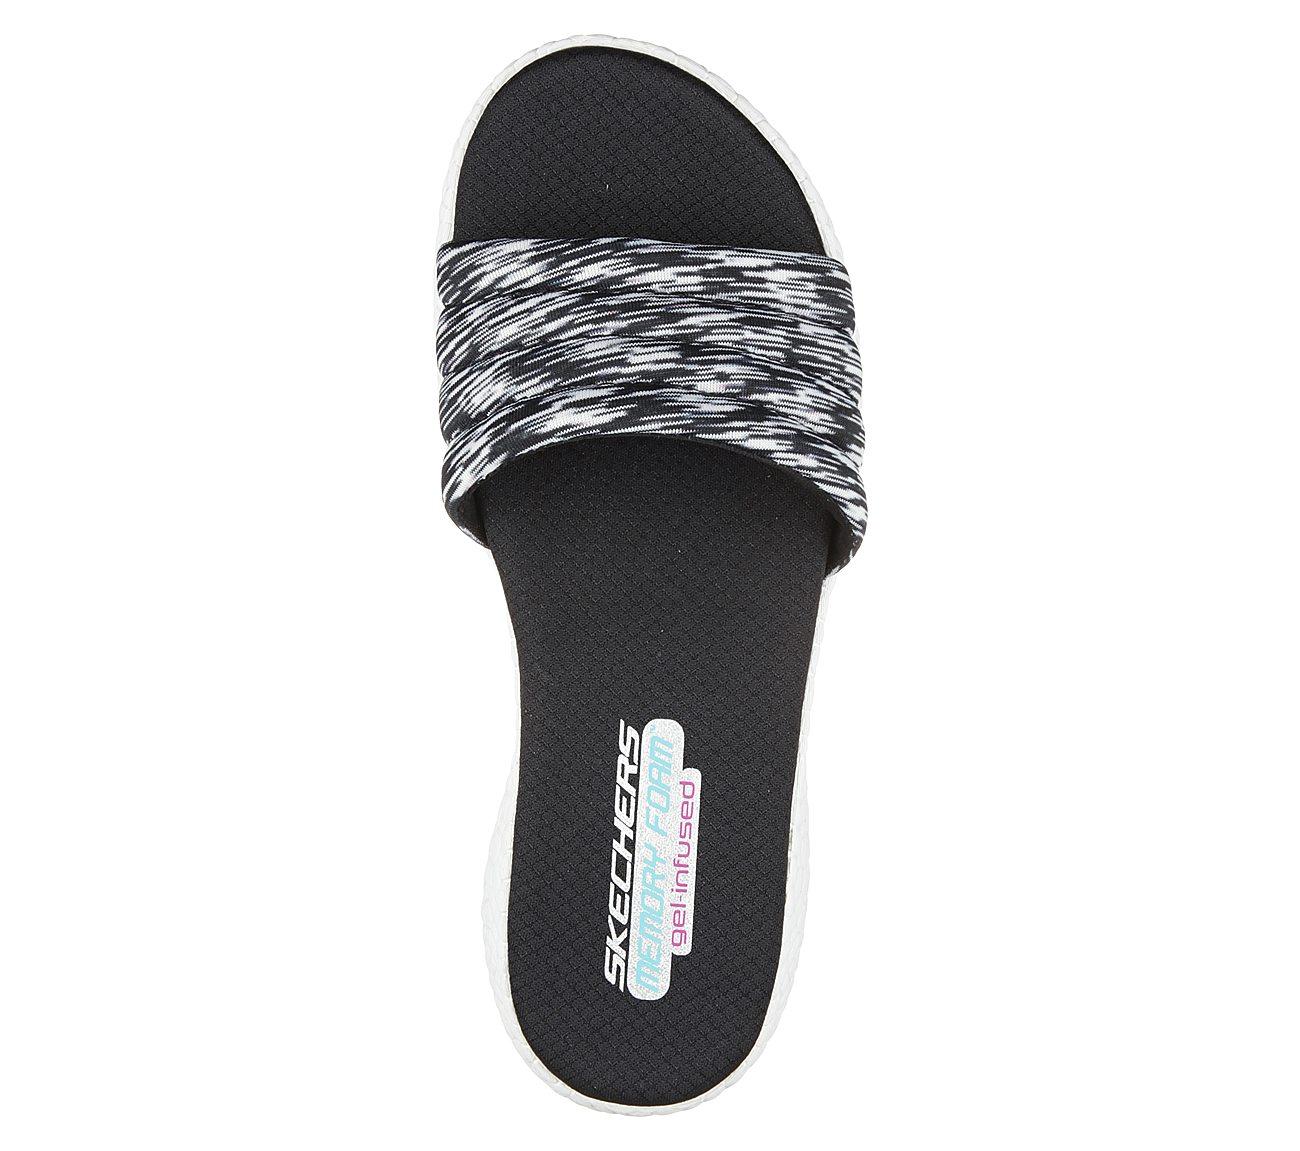 ea8d66a686fc Buy SKECHERS Burst - Elations Comfort Sandals Shoes only  50.00